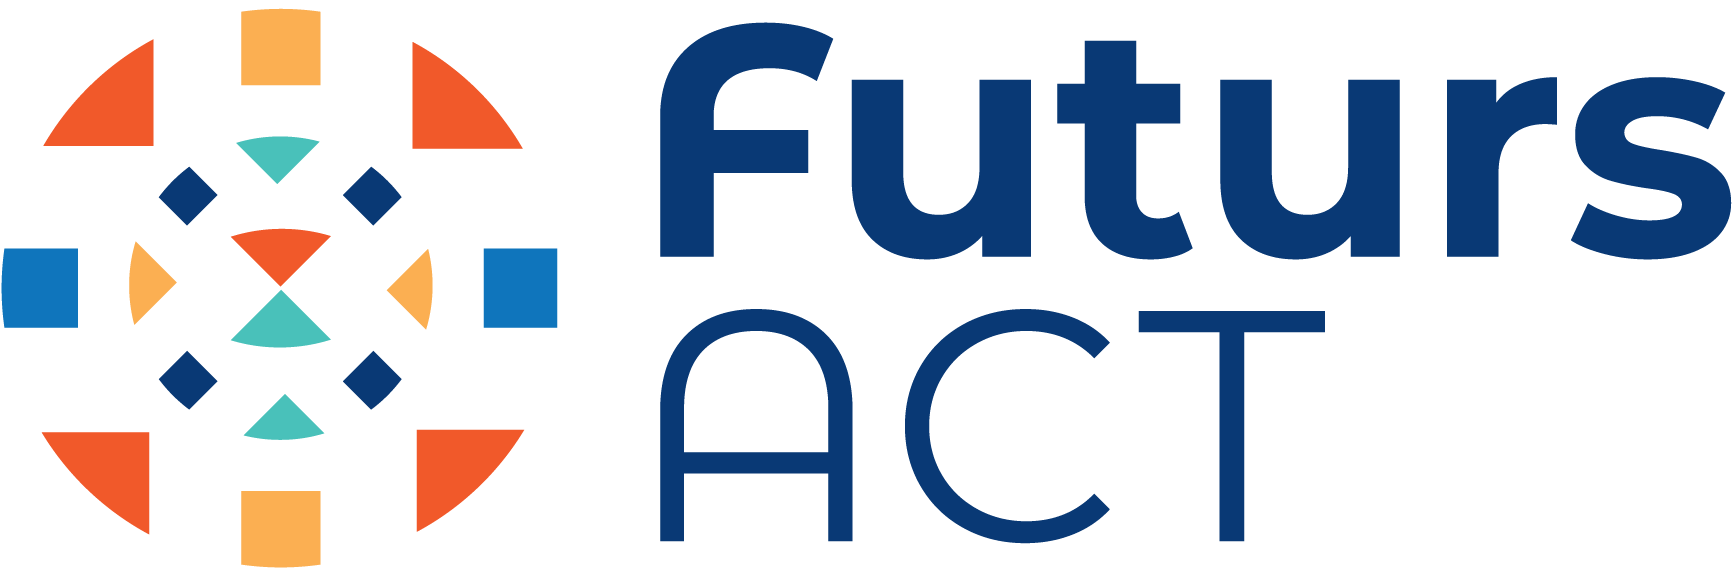 cropped-FUTURS-ACT-logo-1